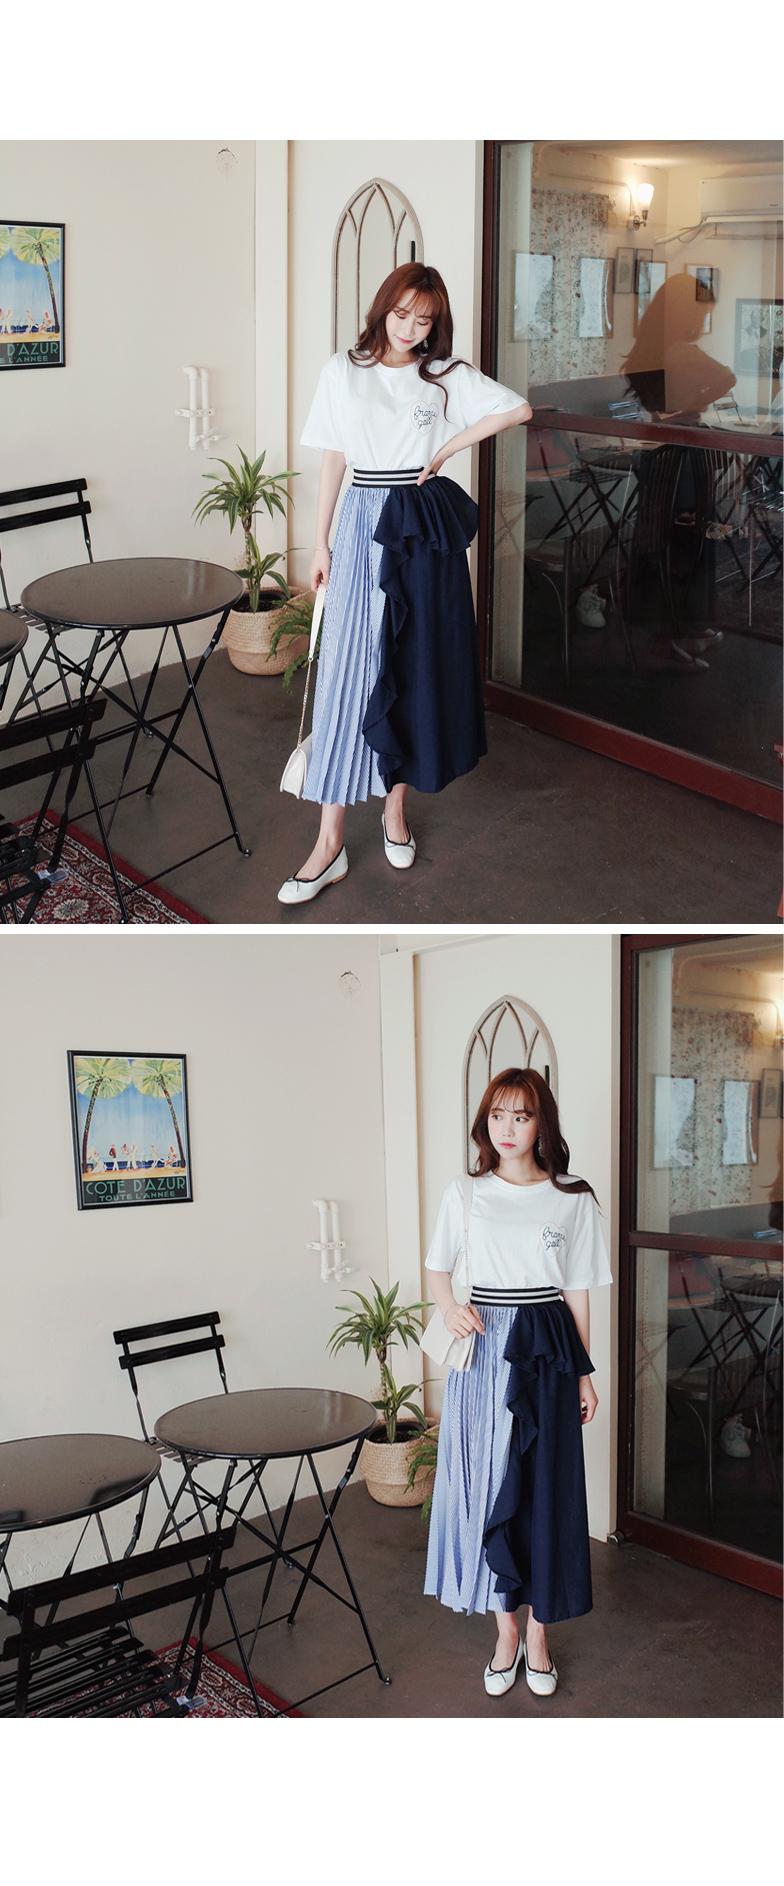 Unique ruffle skirt